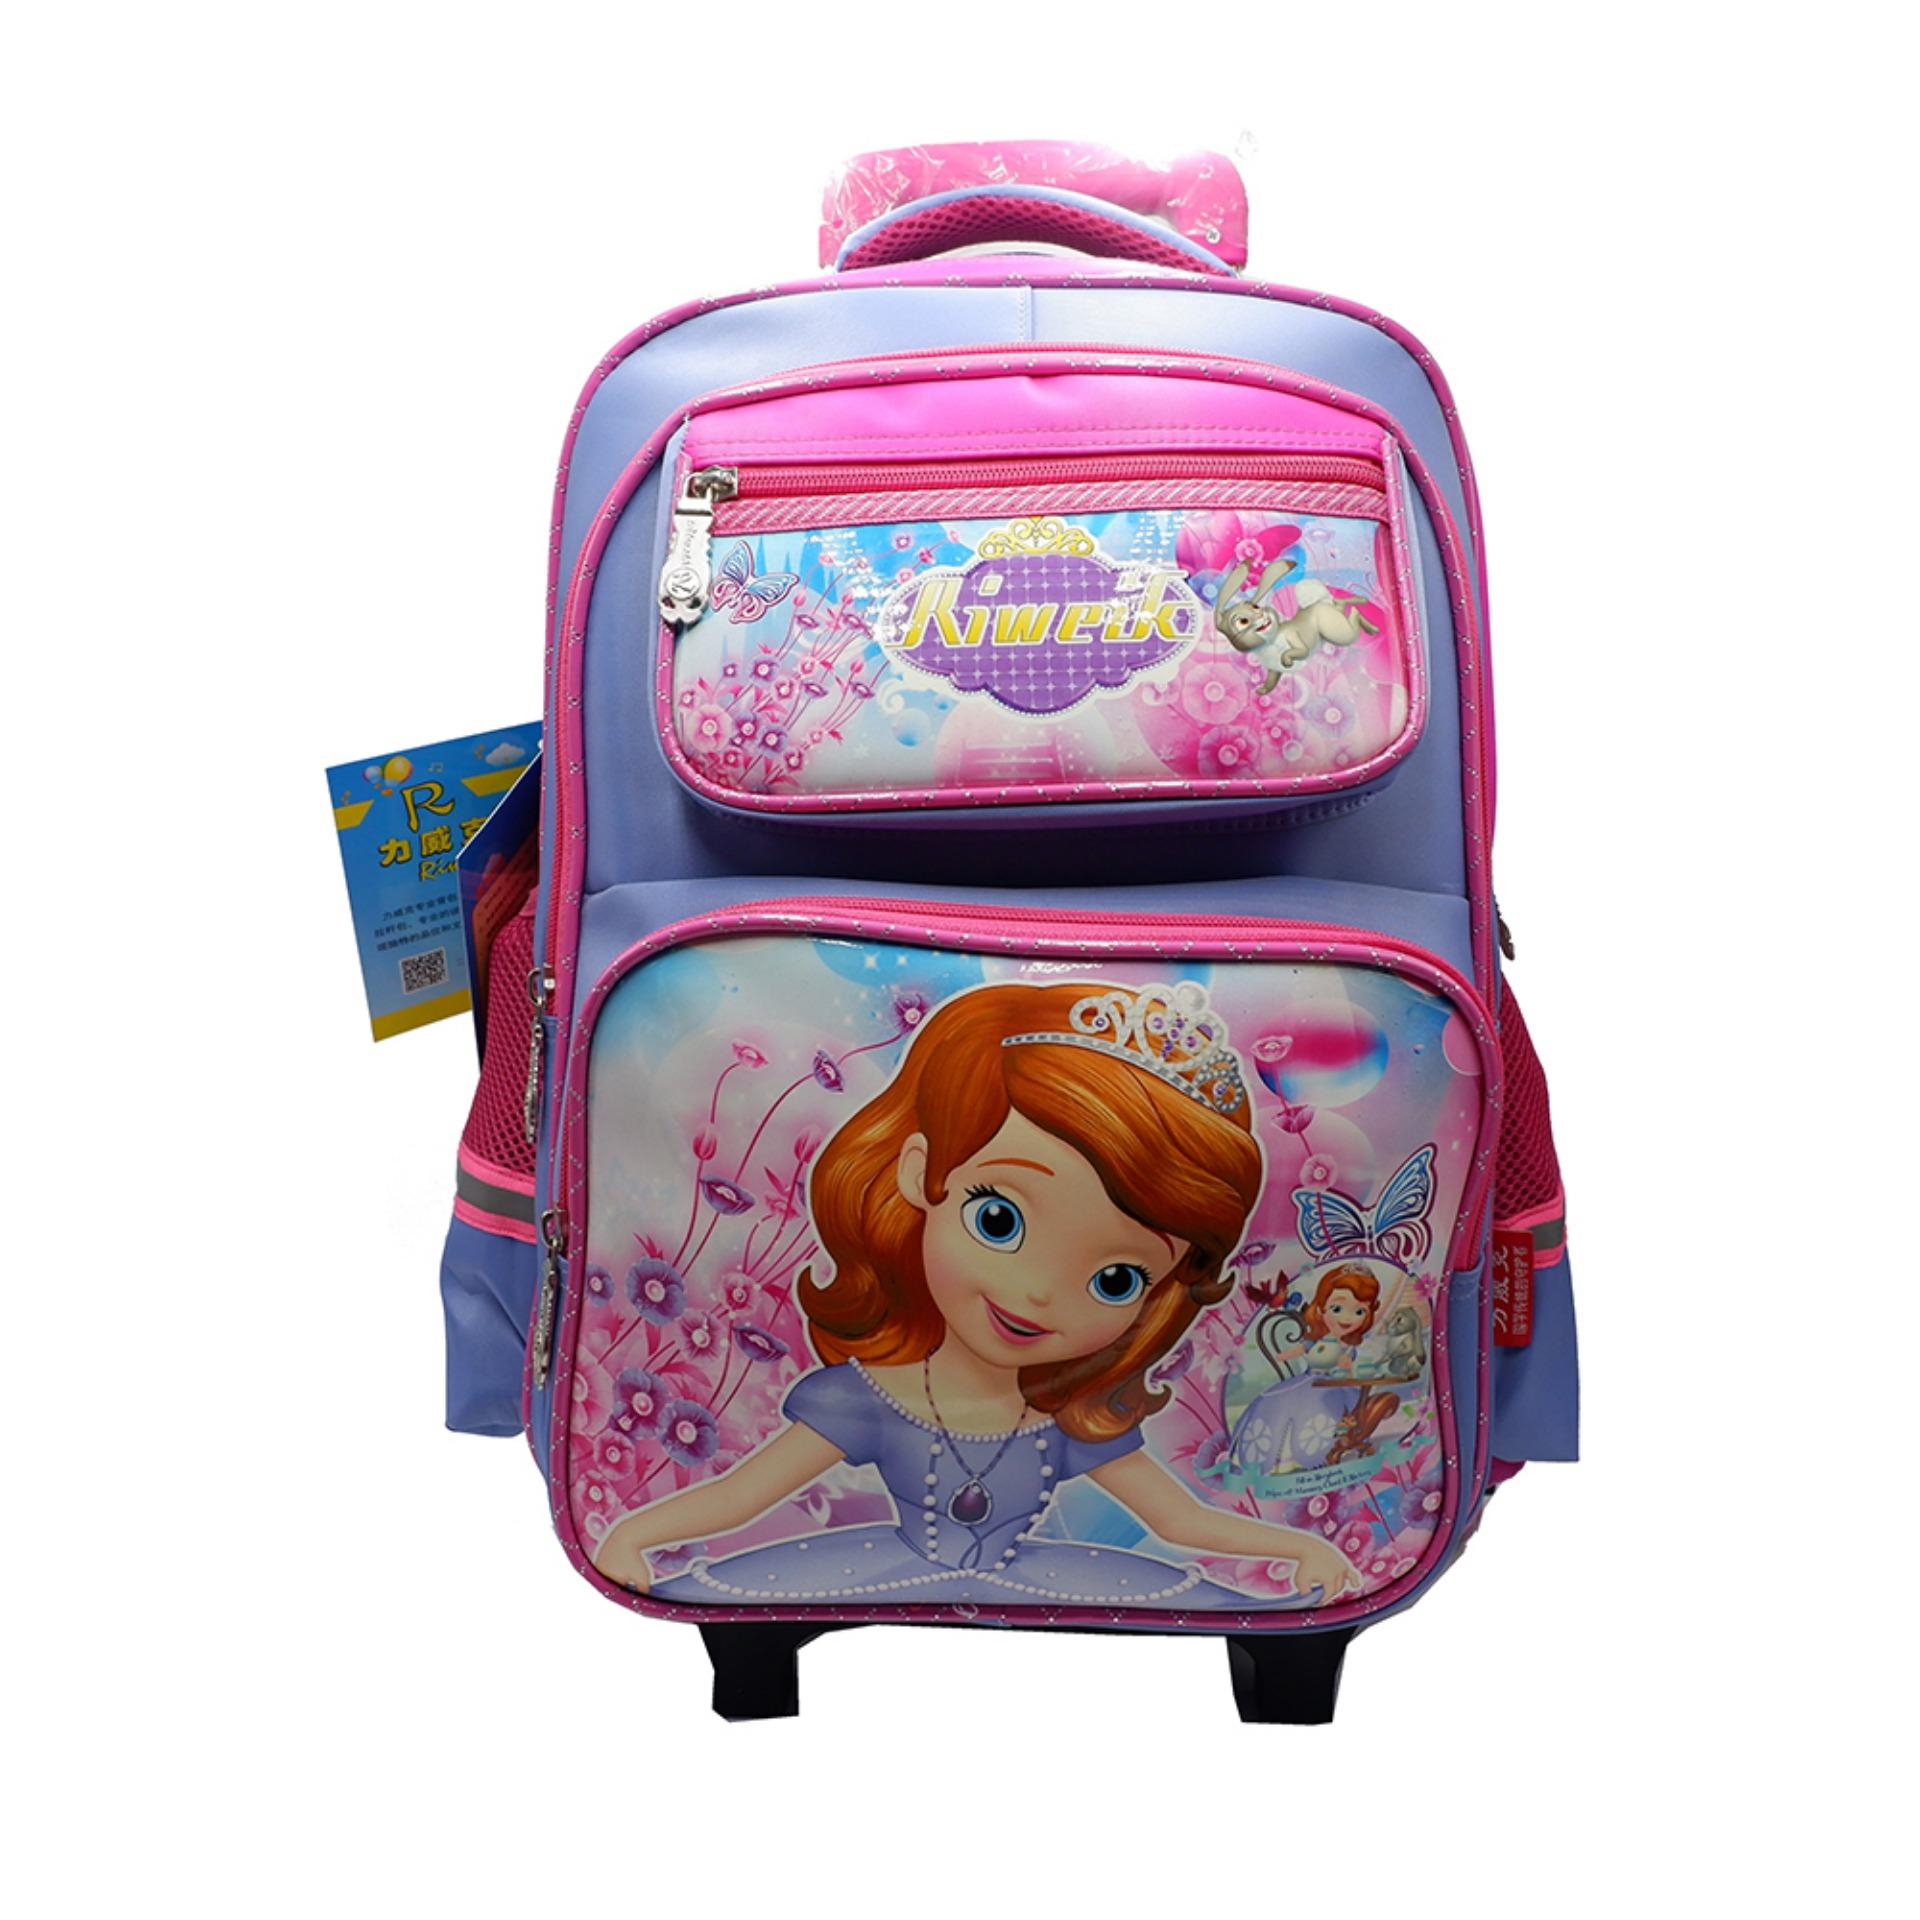 Princess Sofia Six Wheeled Trolley Bag Convertible to Backpack